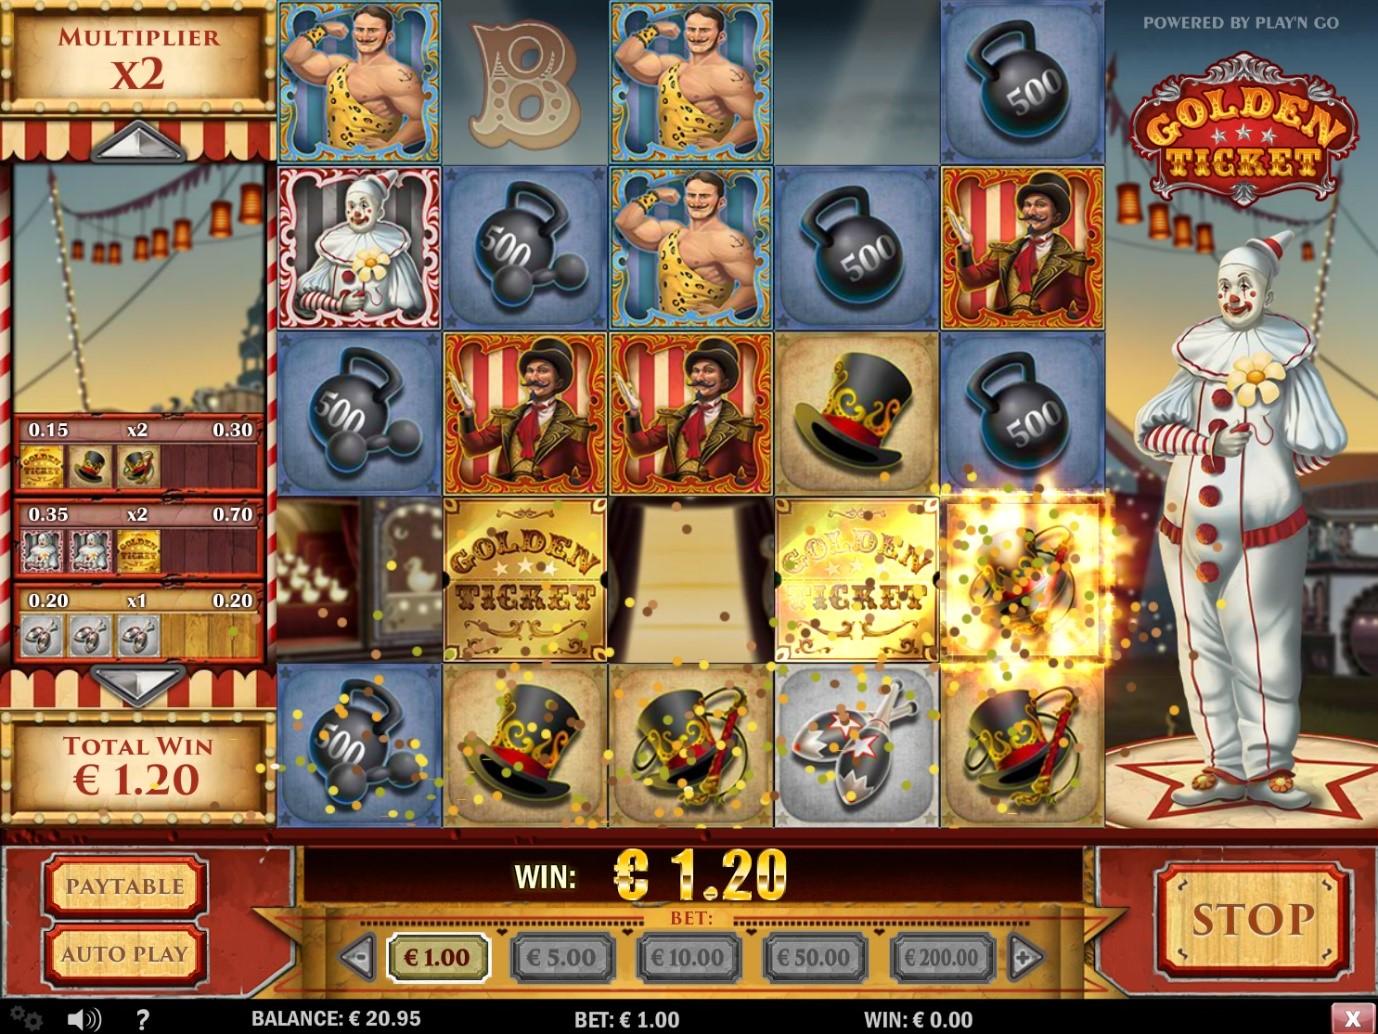 Golden ticket circus slot game